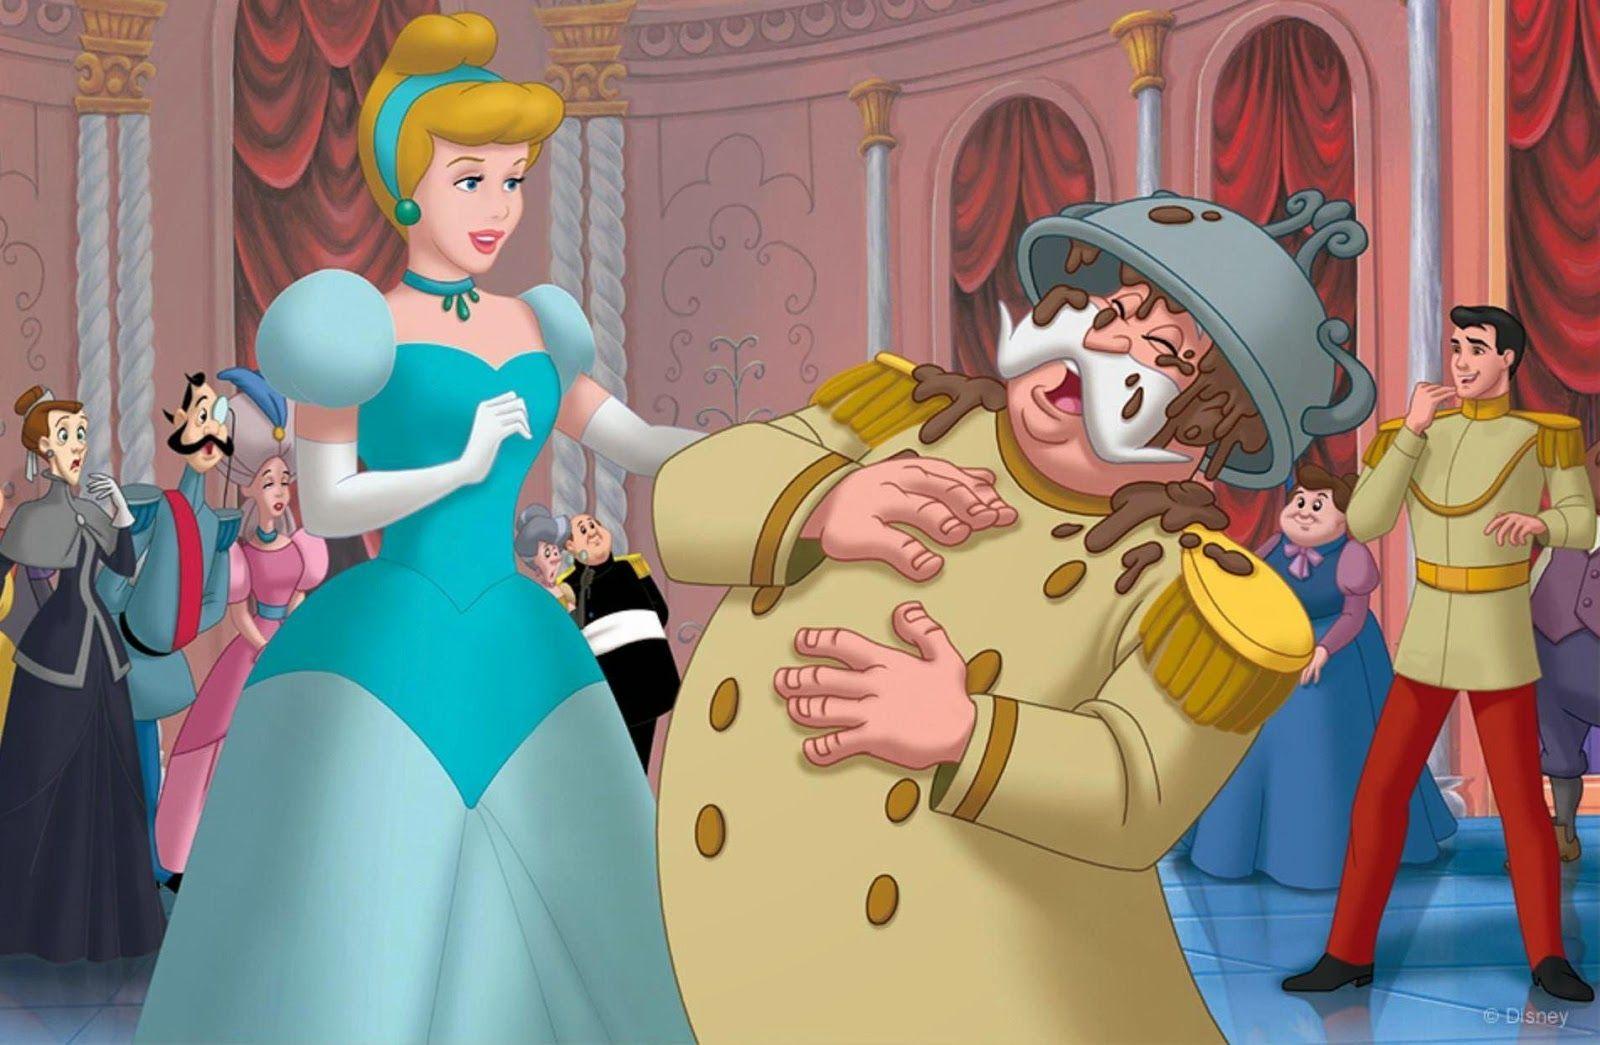 Disney princesses and princes image by 𝓖𝓵𝓪𝓼𝓼 𝓼𝓵𝓲𝓹𝓹𝓮𝓻𝓼 on